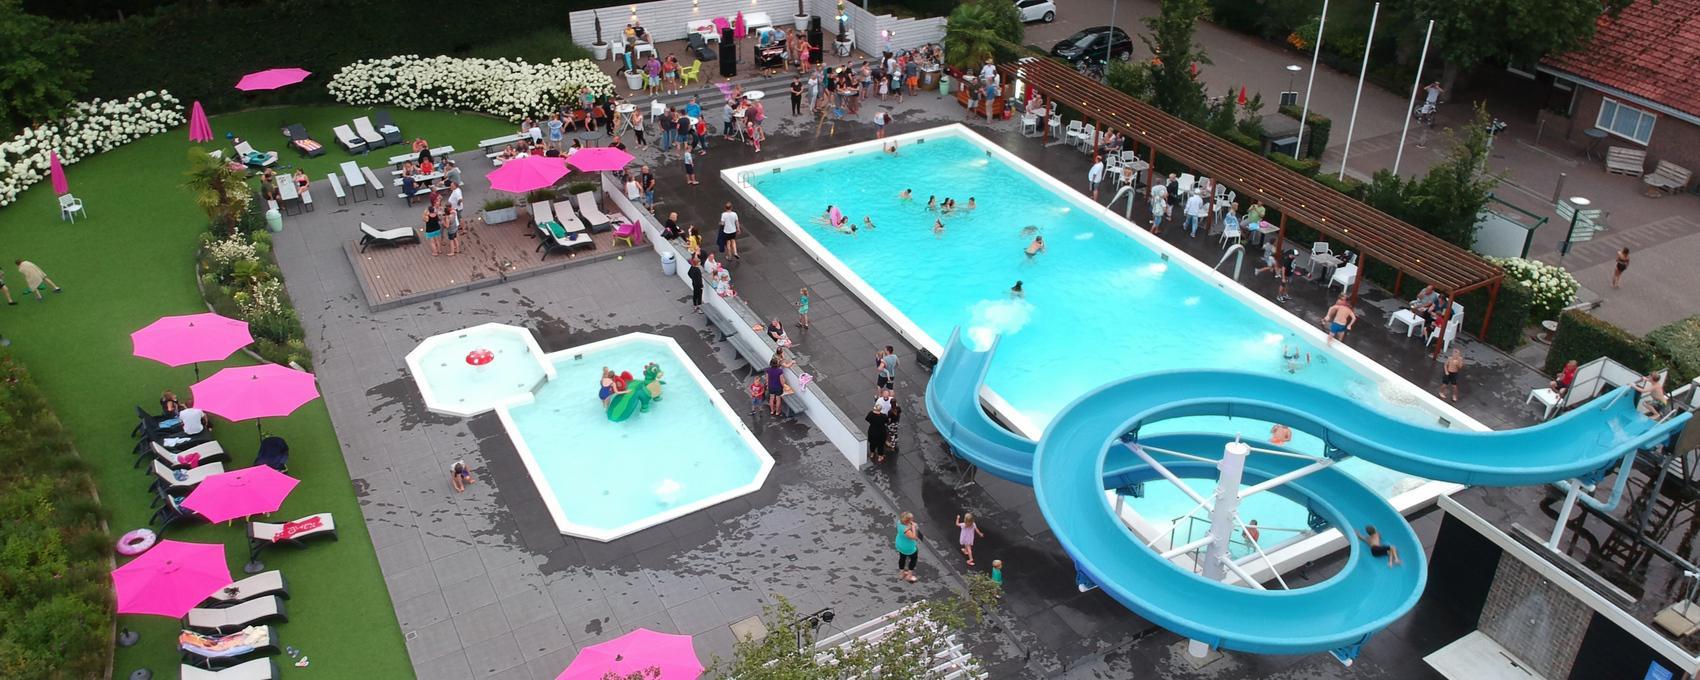 Campingplatz mit Schwimmbad Winterswijk